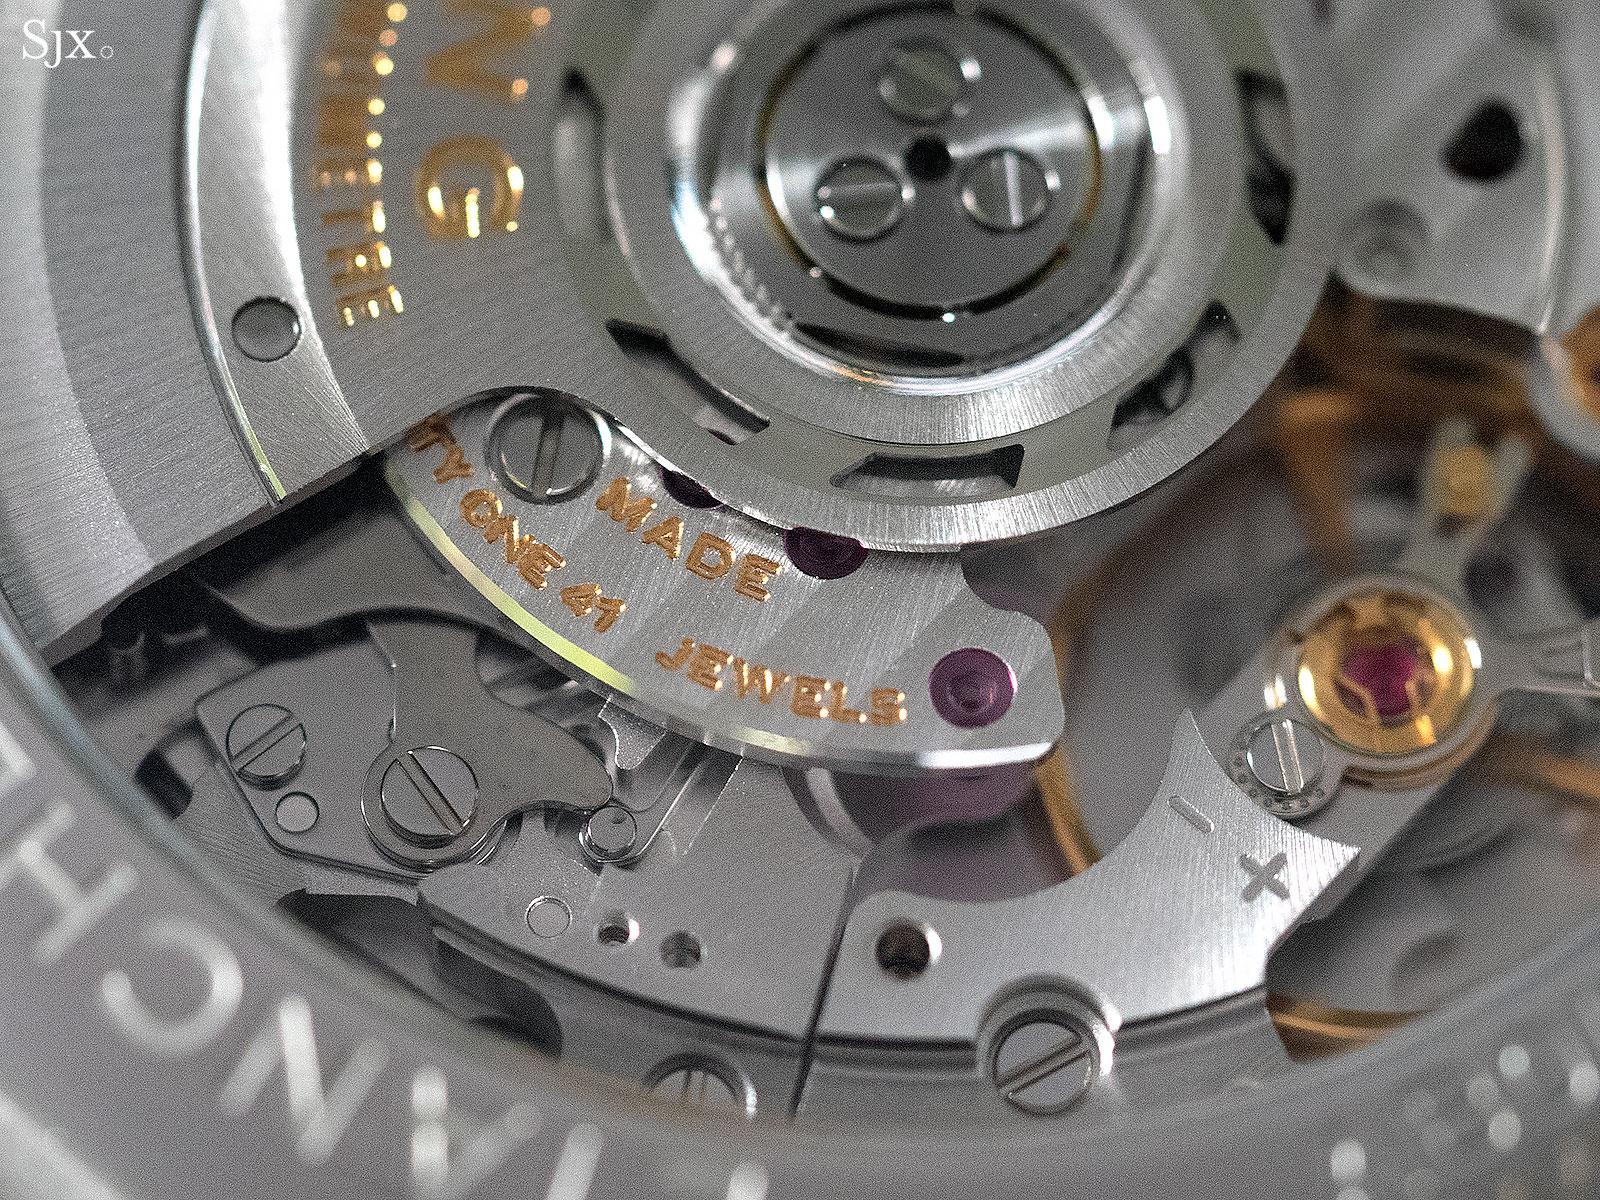 Breitling Premier B01 movement 2